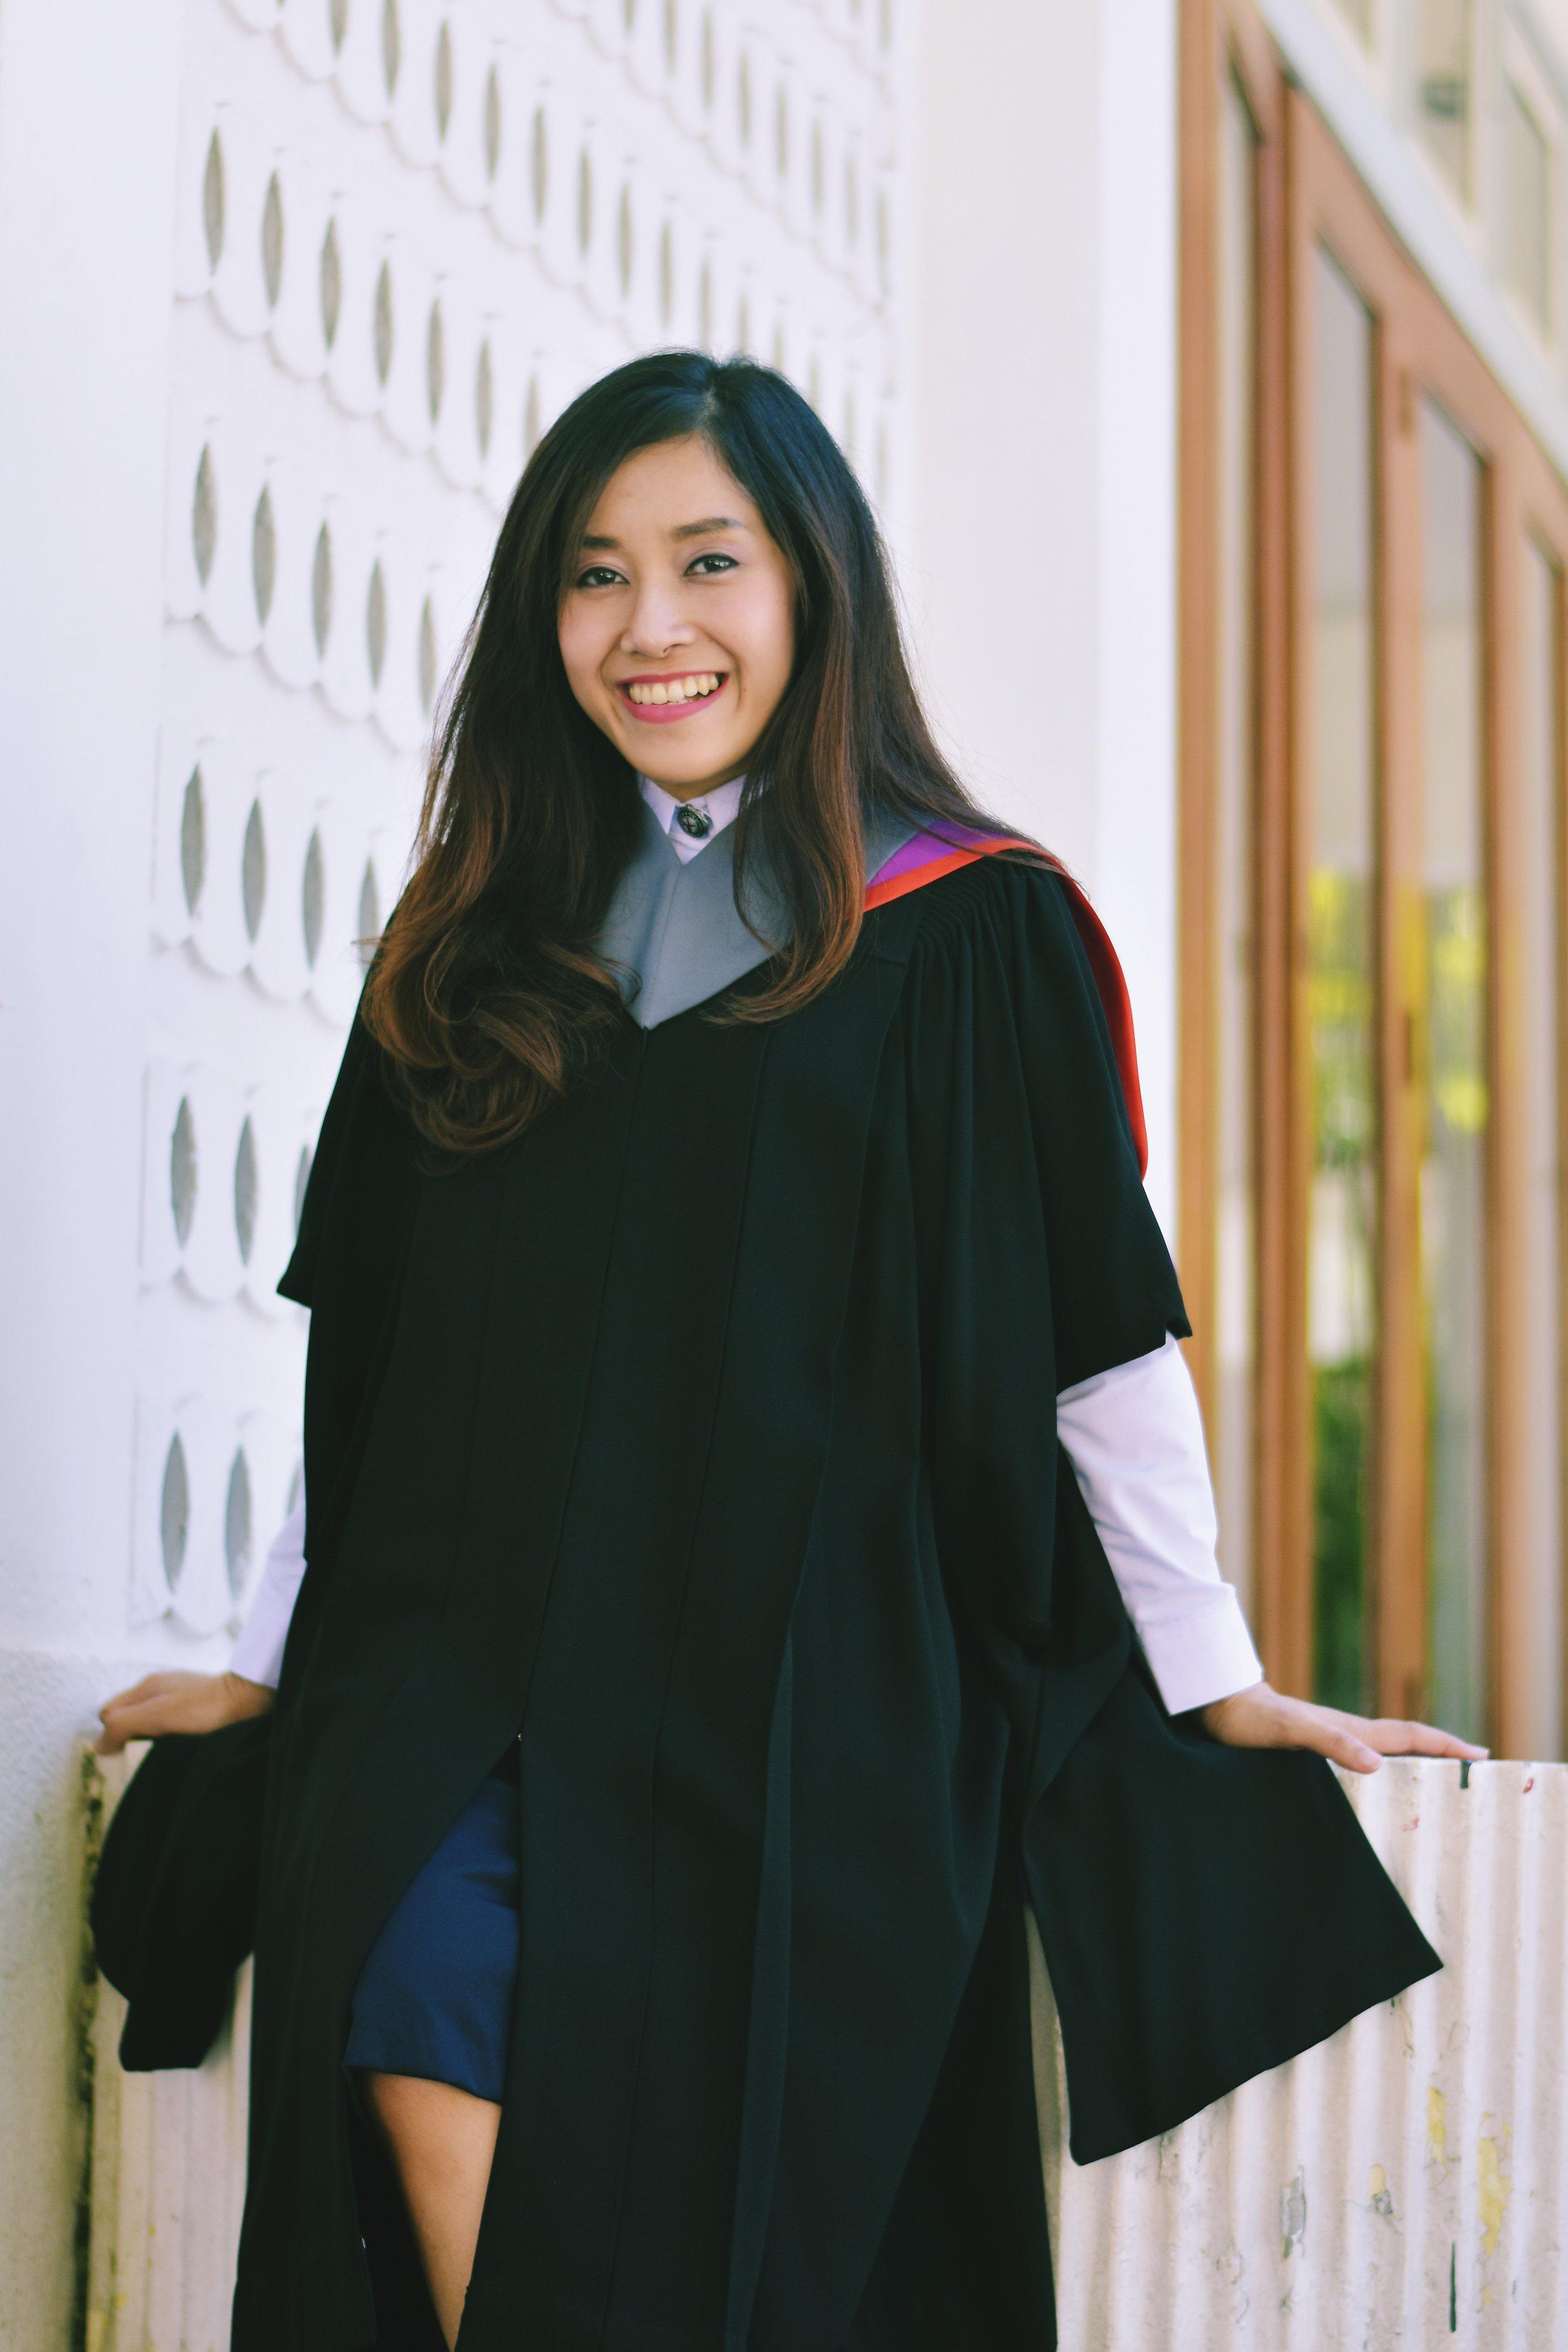 Take a look at last year's graduation photos! -